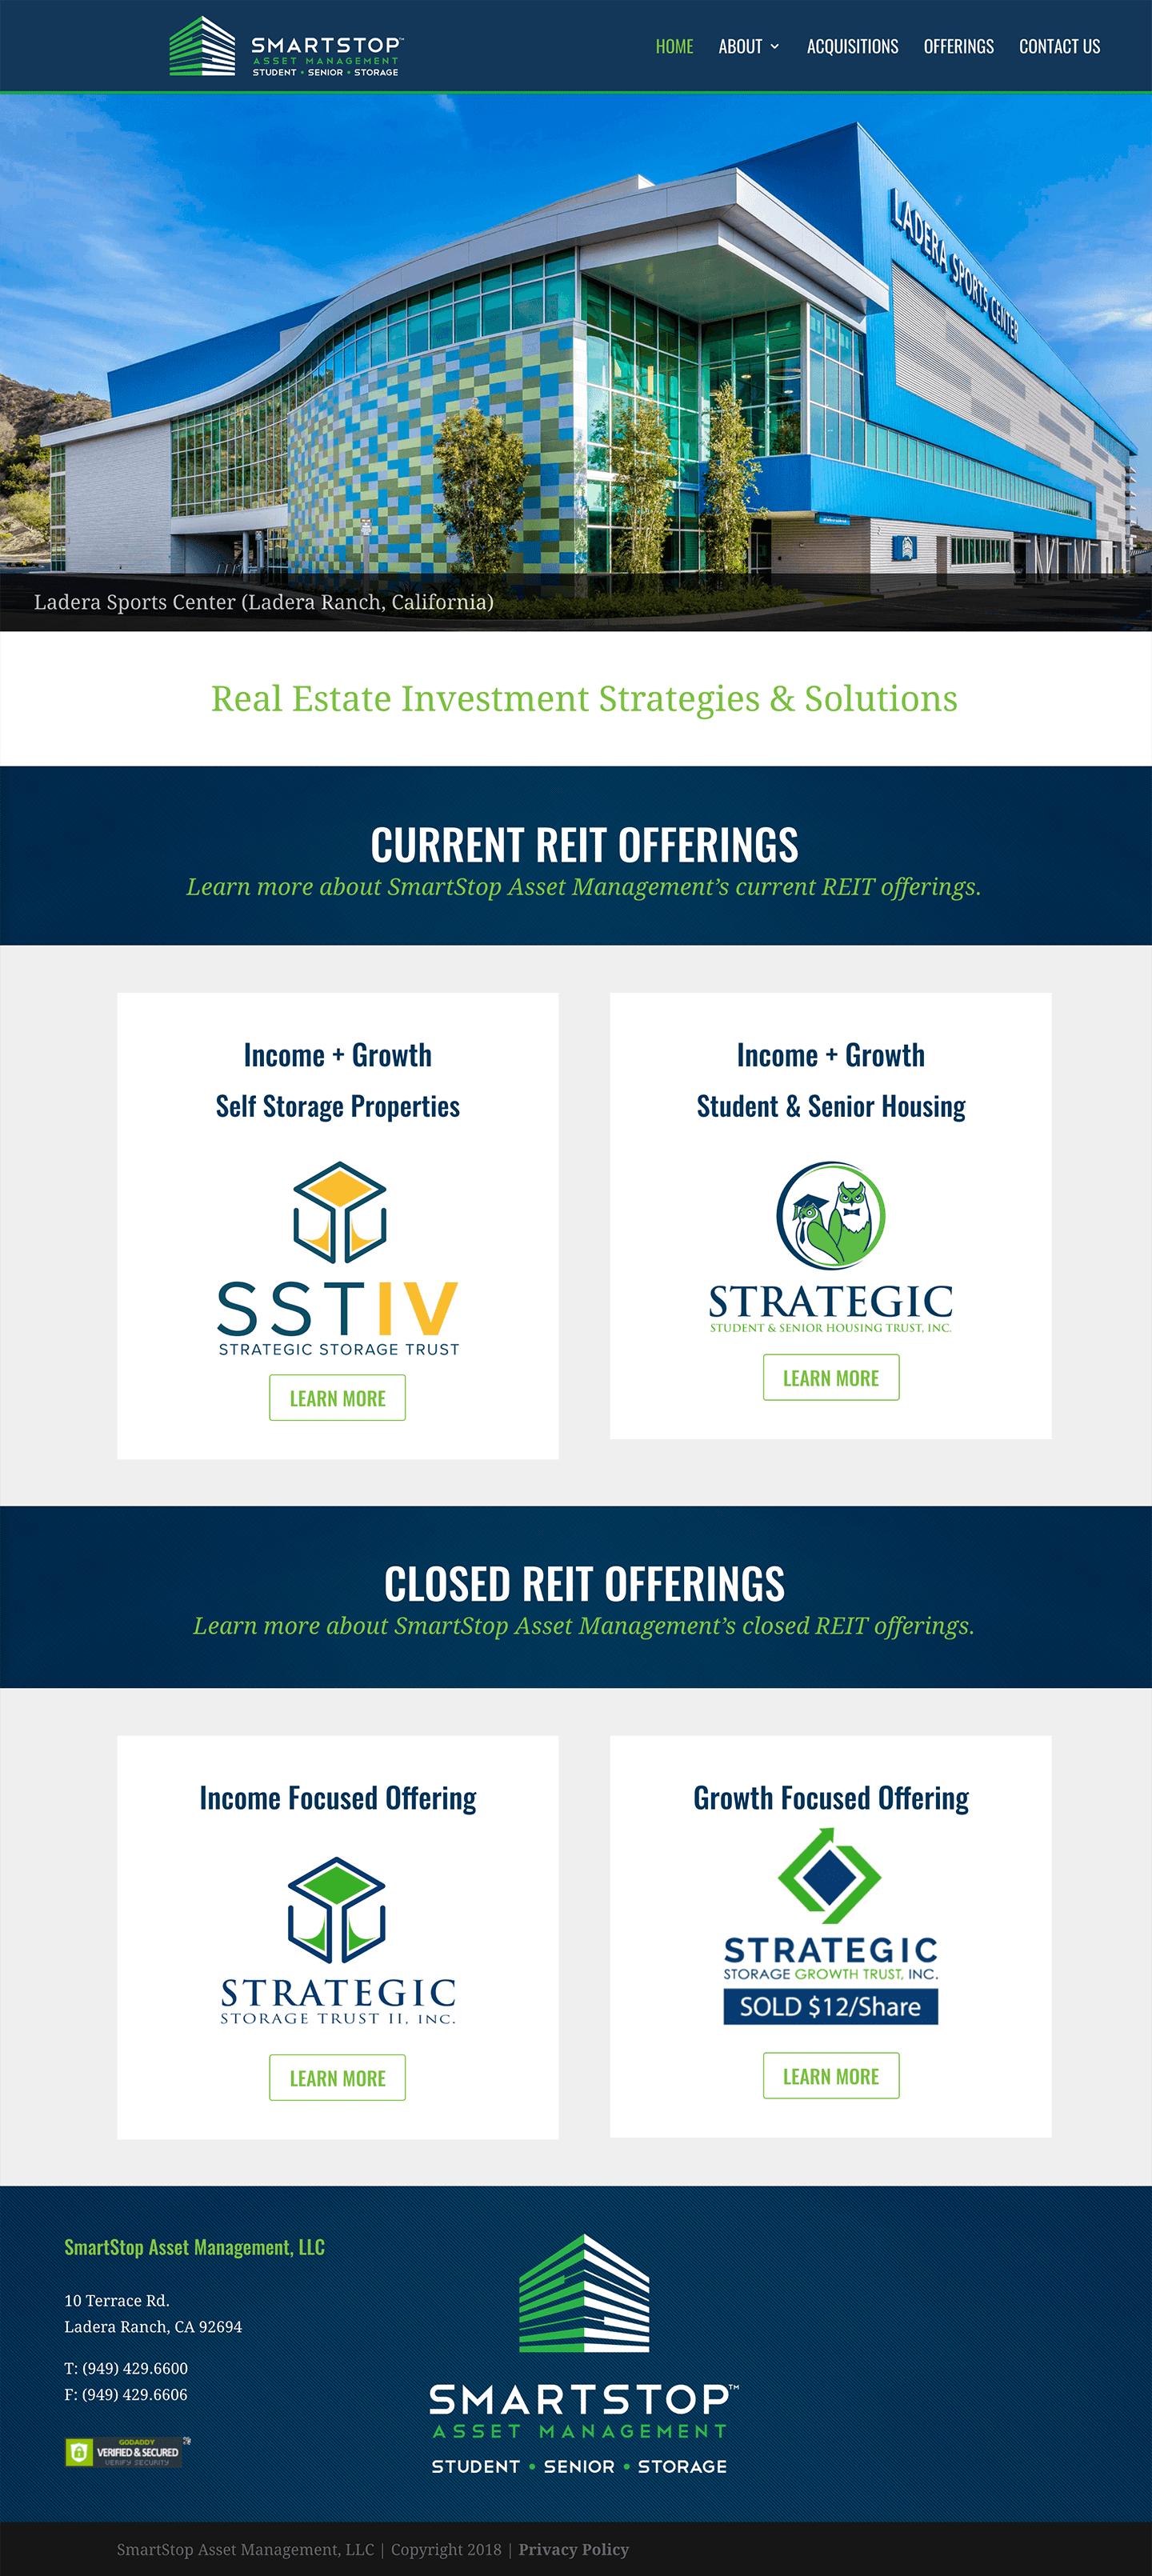 SmartStop-Asset-Management-Real-Estate-Investment-Trust-REIT-1031-Exchanges-Website-Design-Home-Page